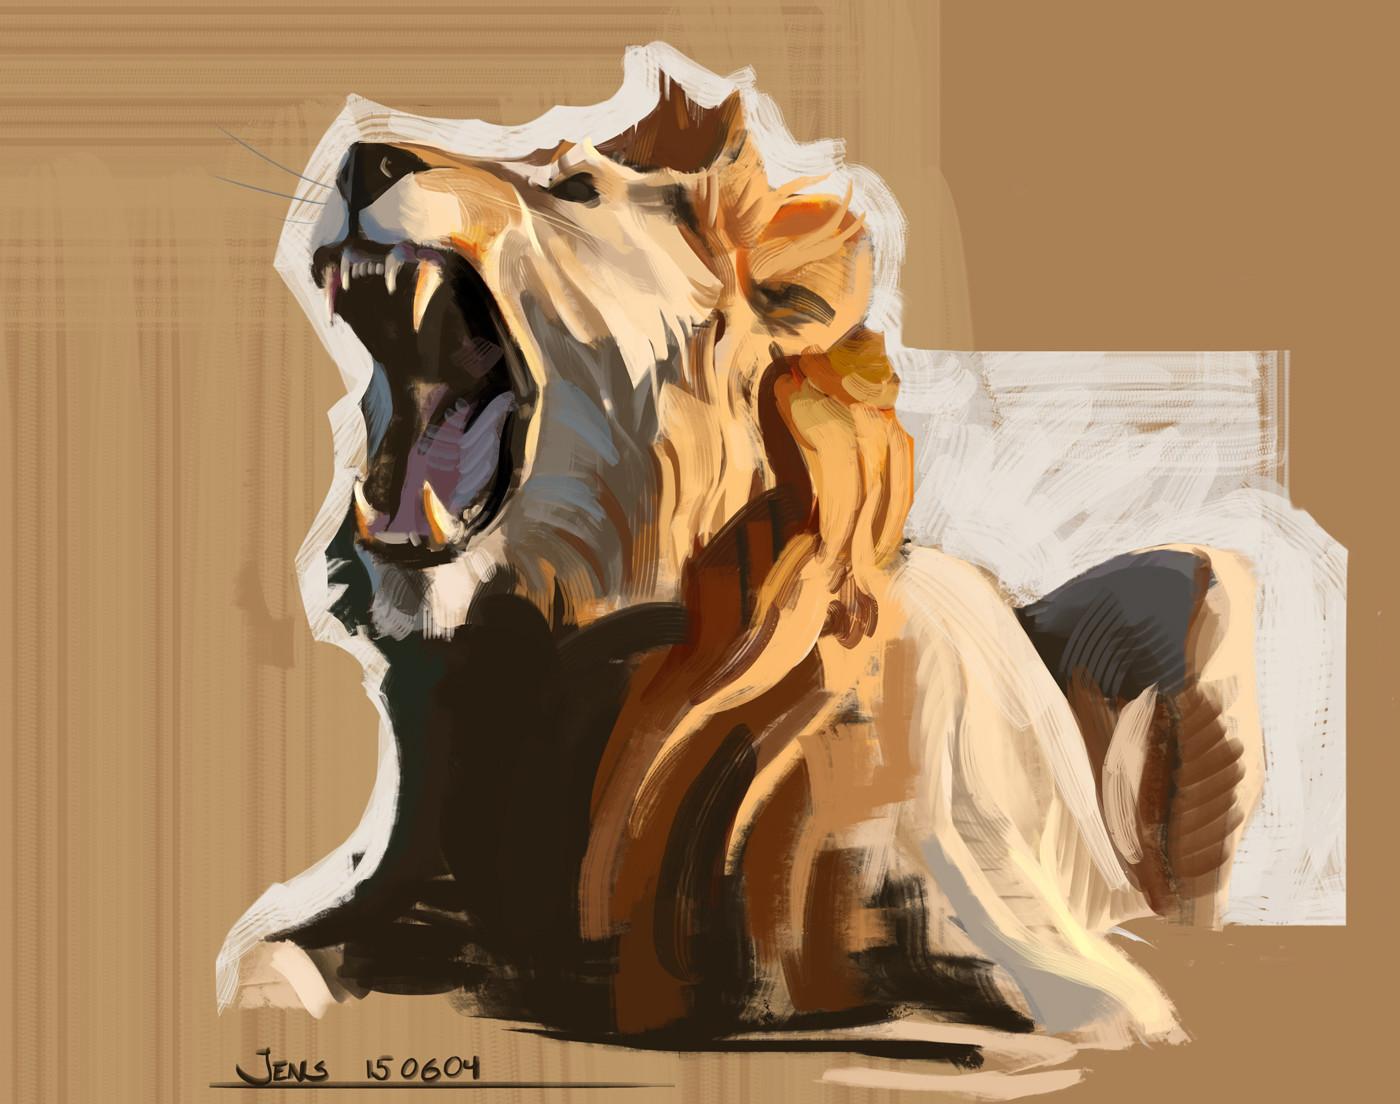 Jens bengtsson study lion 01